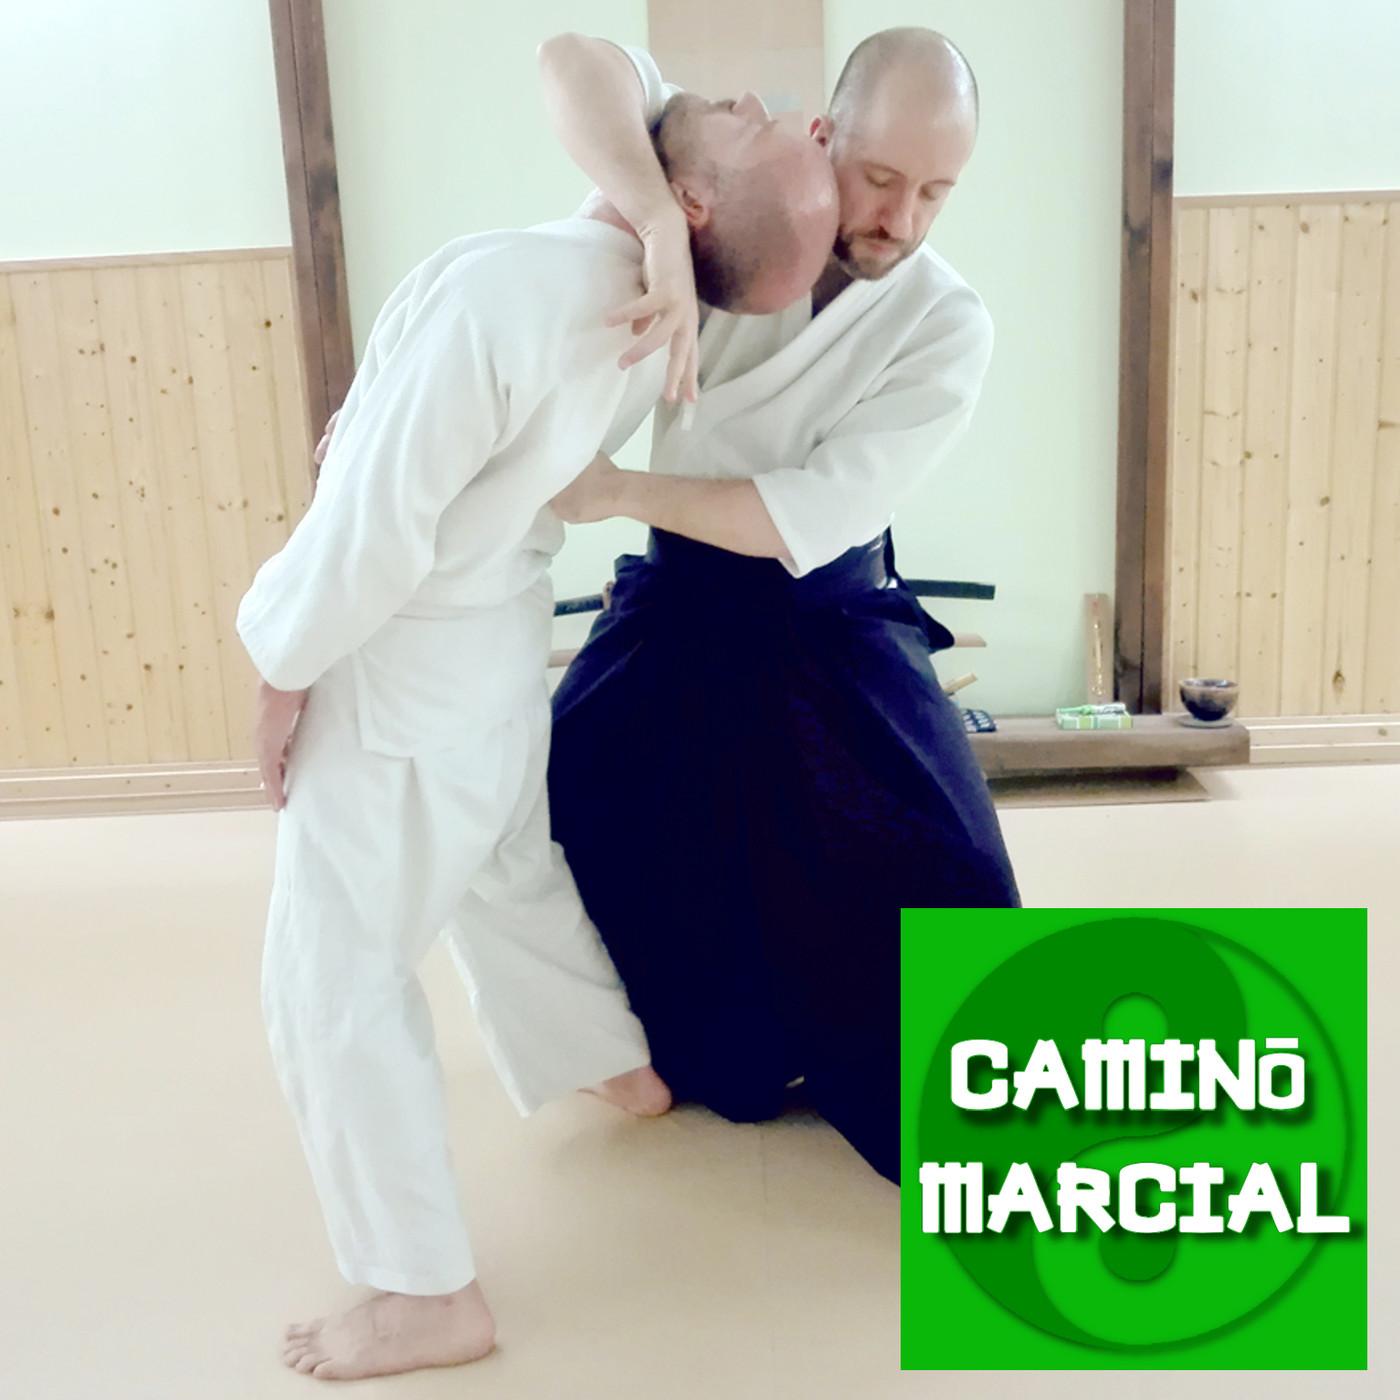 CAMINO MARCIAL nº89 - Xavier Teixidó (Nihon Jujutsu)